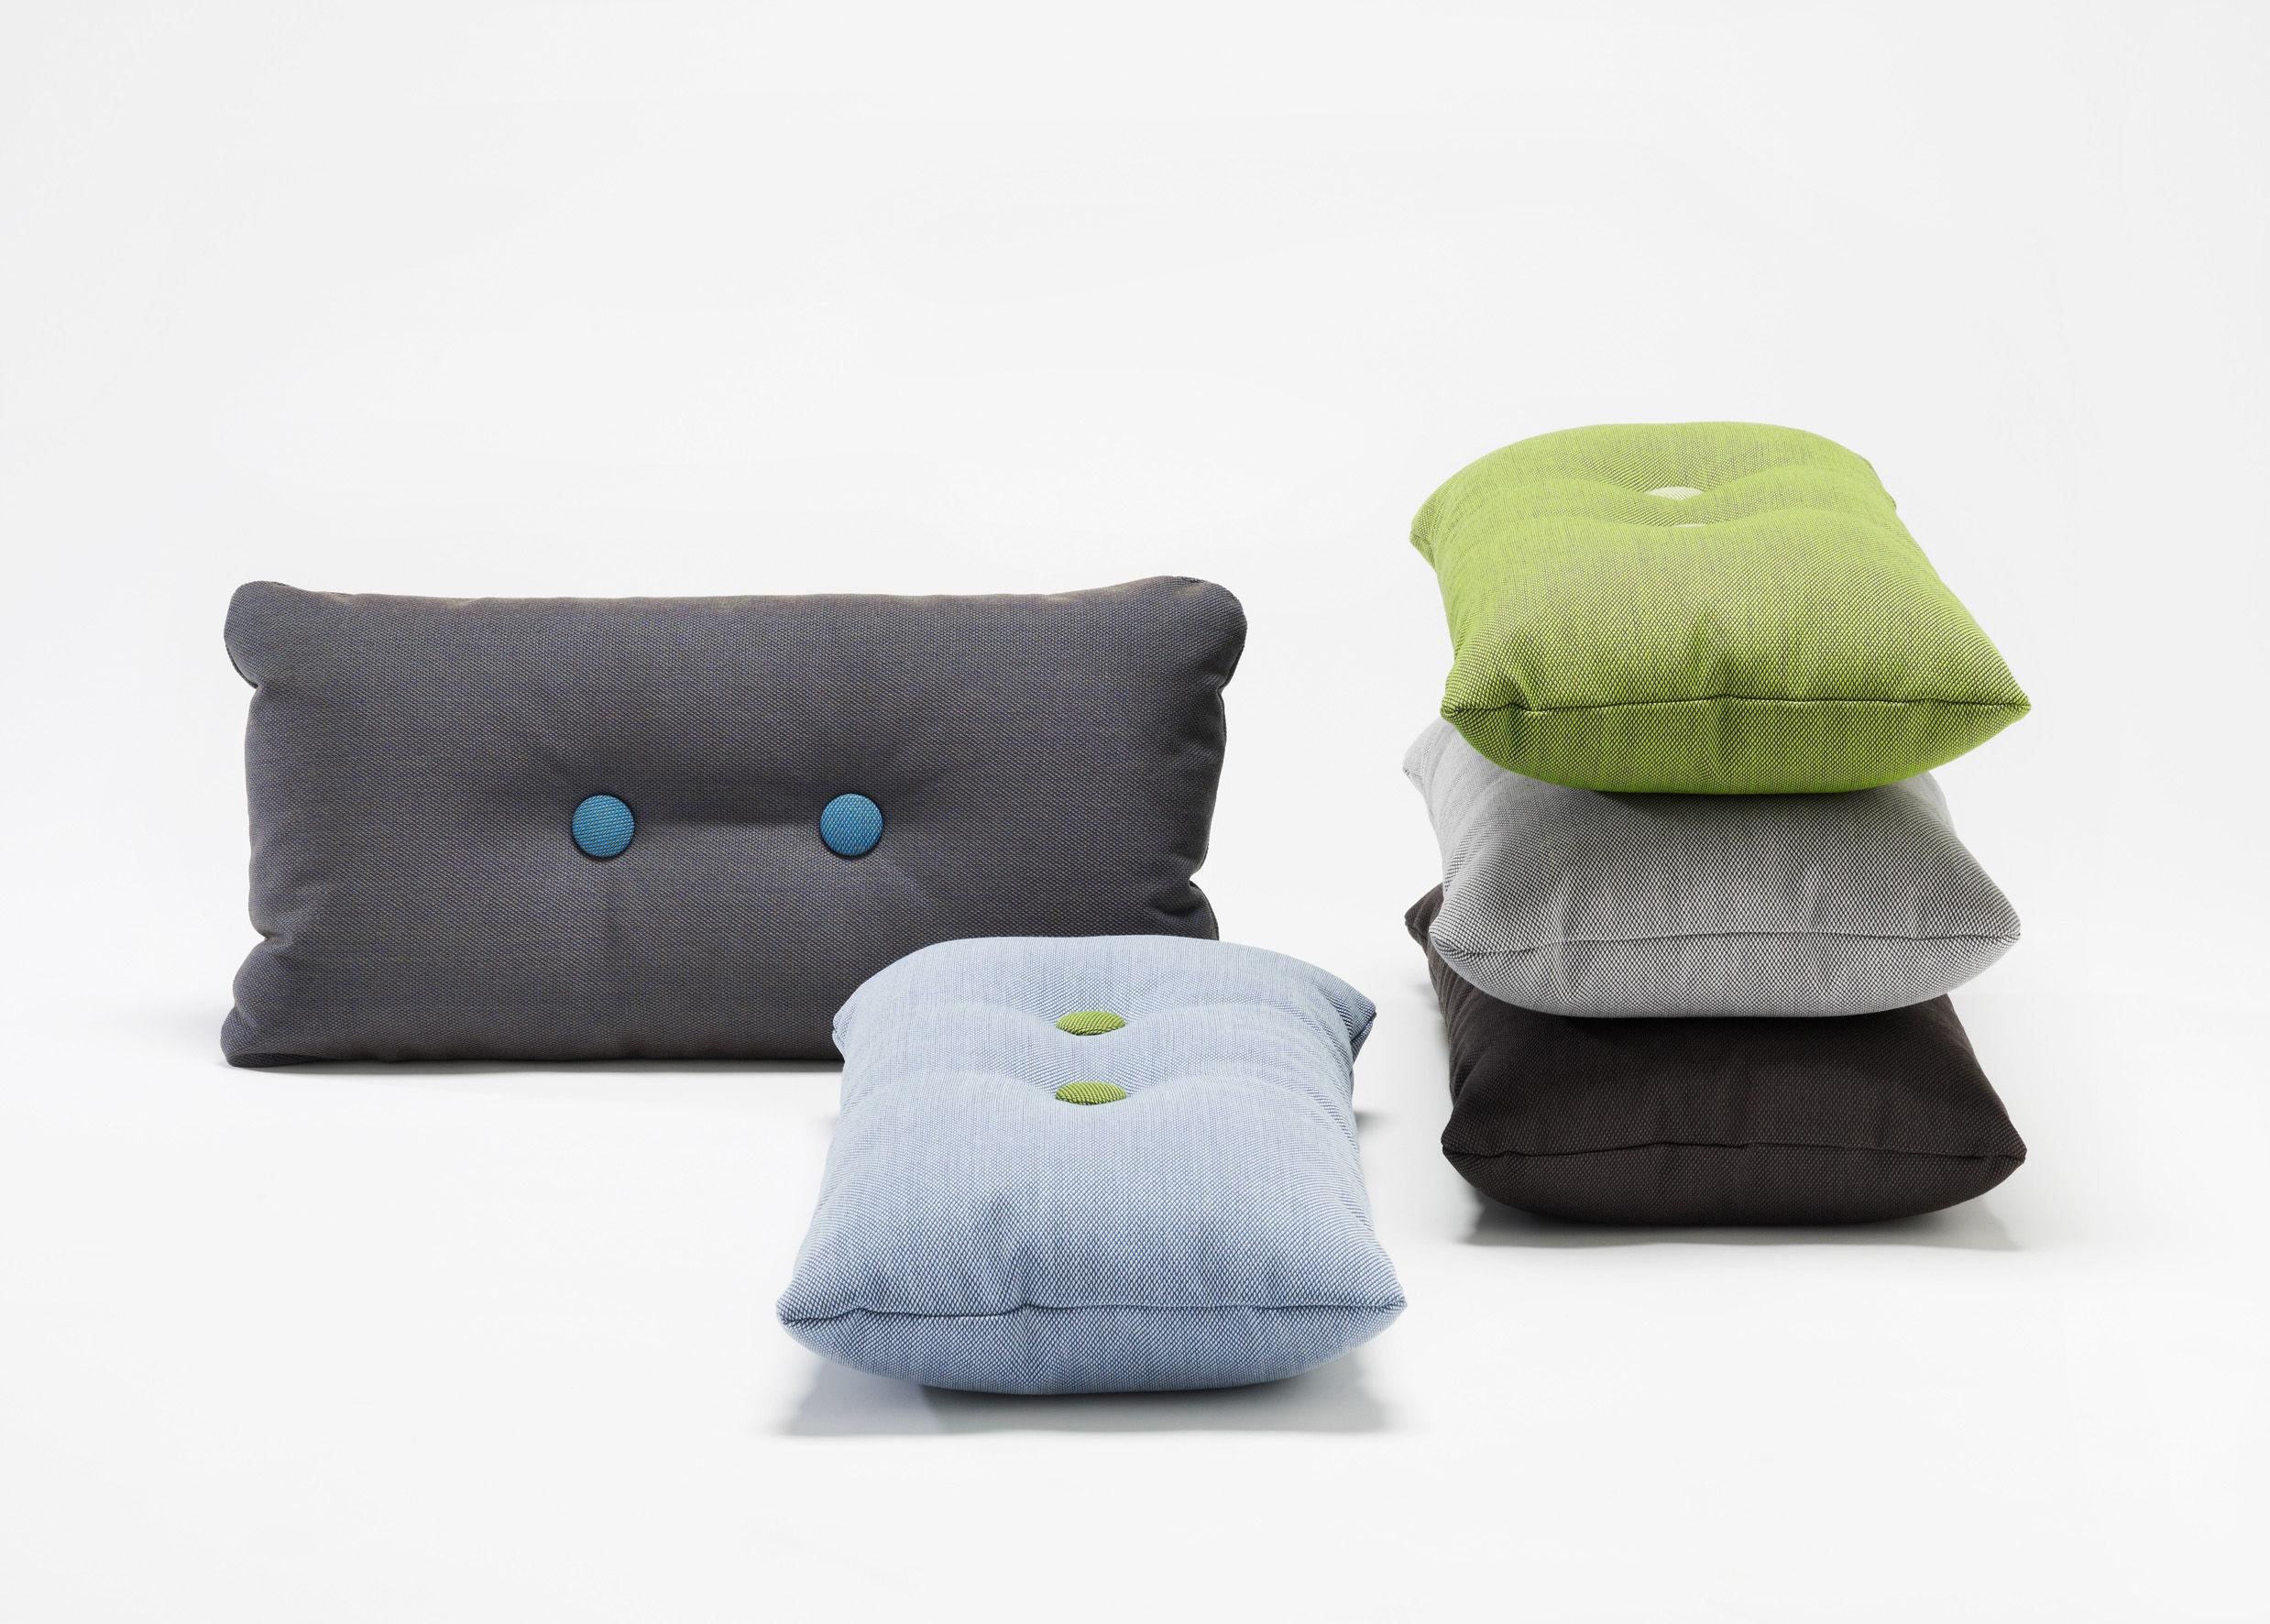 AuBergewohnlich ... Decoration   Cushions U0026 Poufs   Dot   Steelcut Trio Cushion   74 X 40 Cm